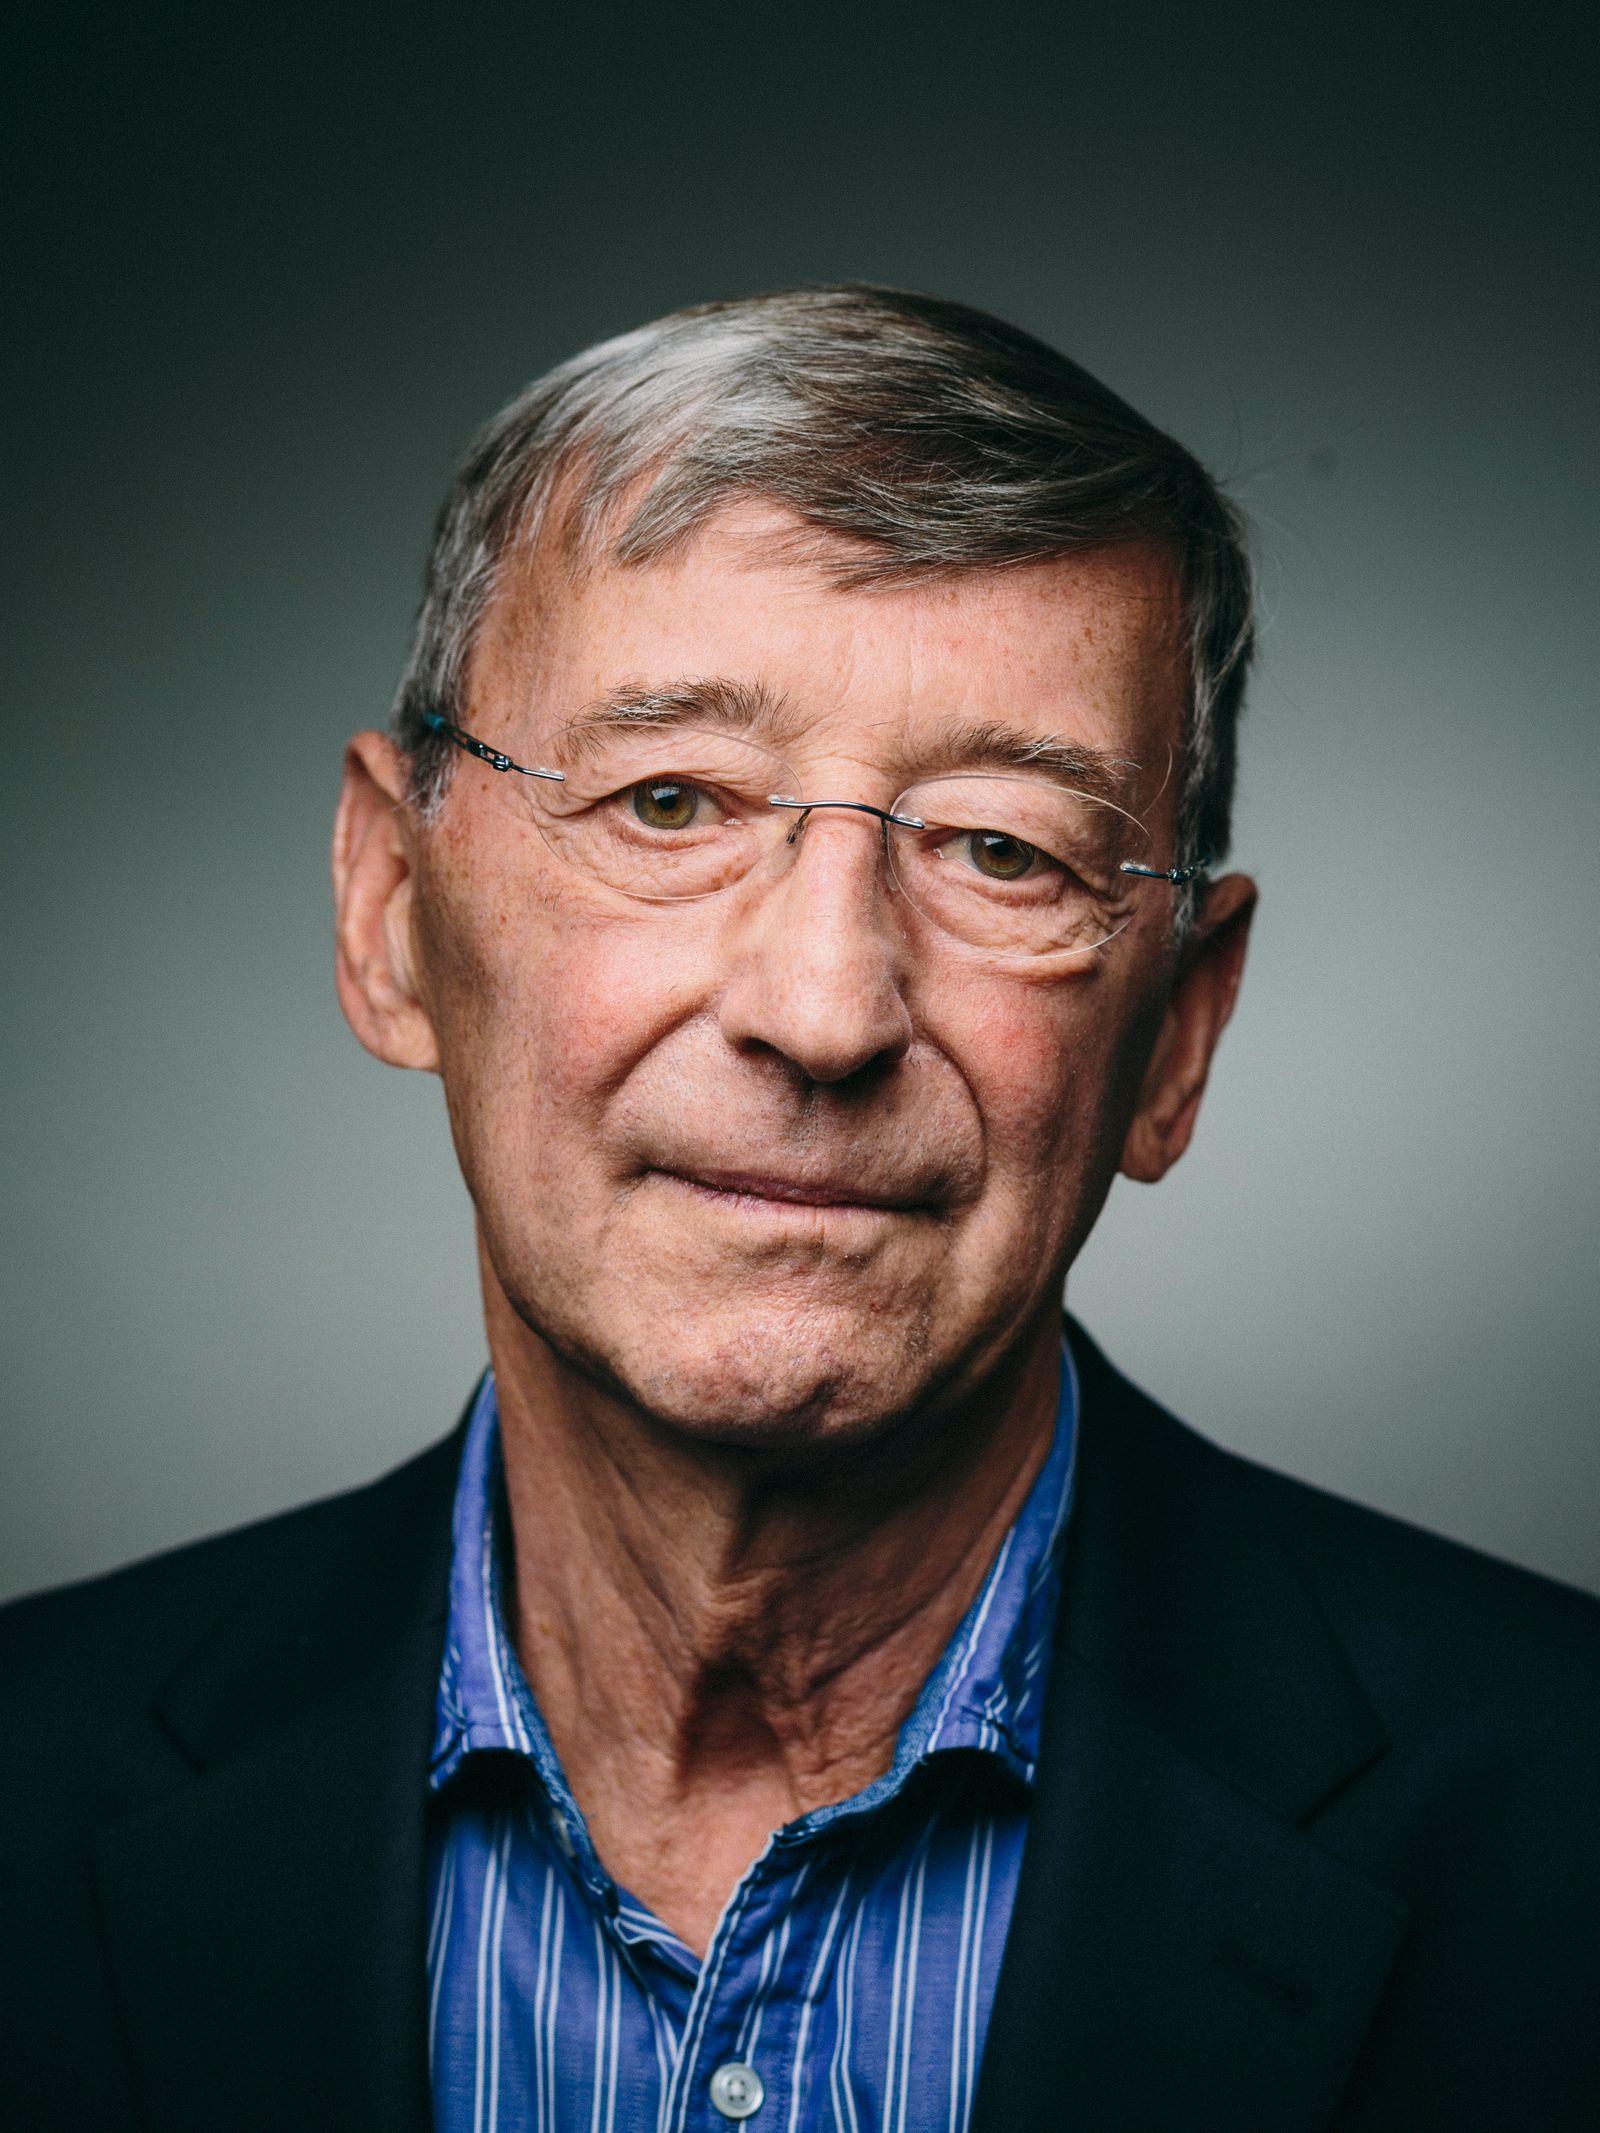 Ludwig Pohl, ehem. Forschungsleiter Merck, Darmstadt